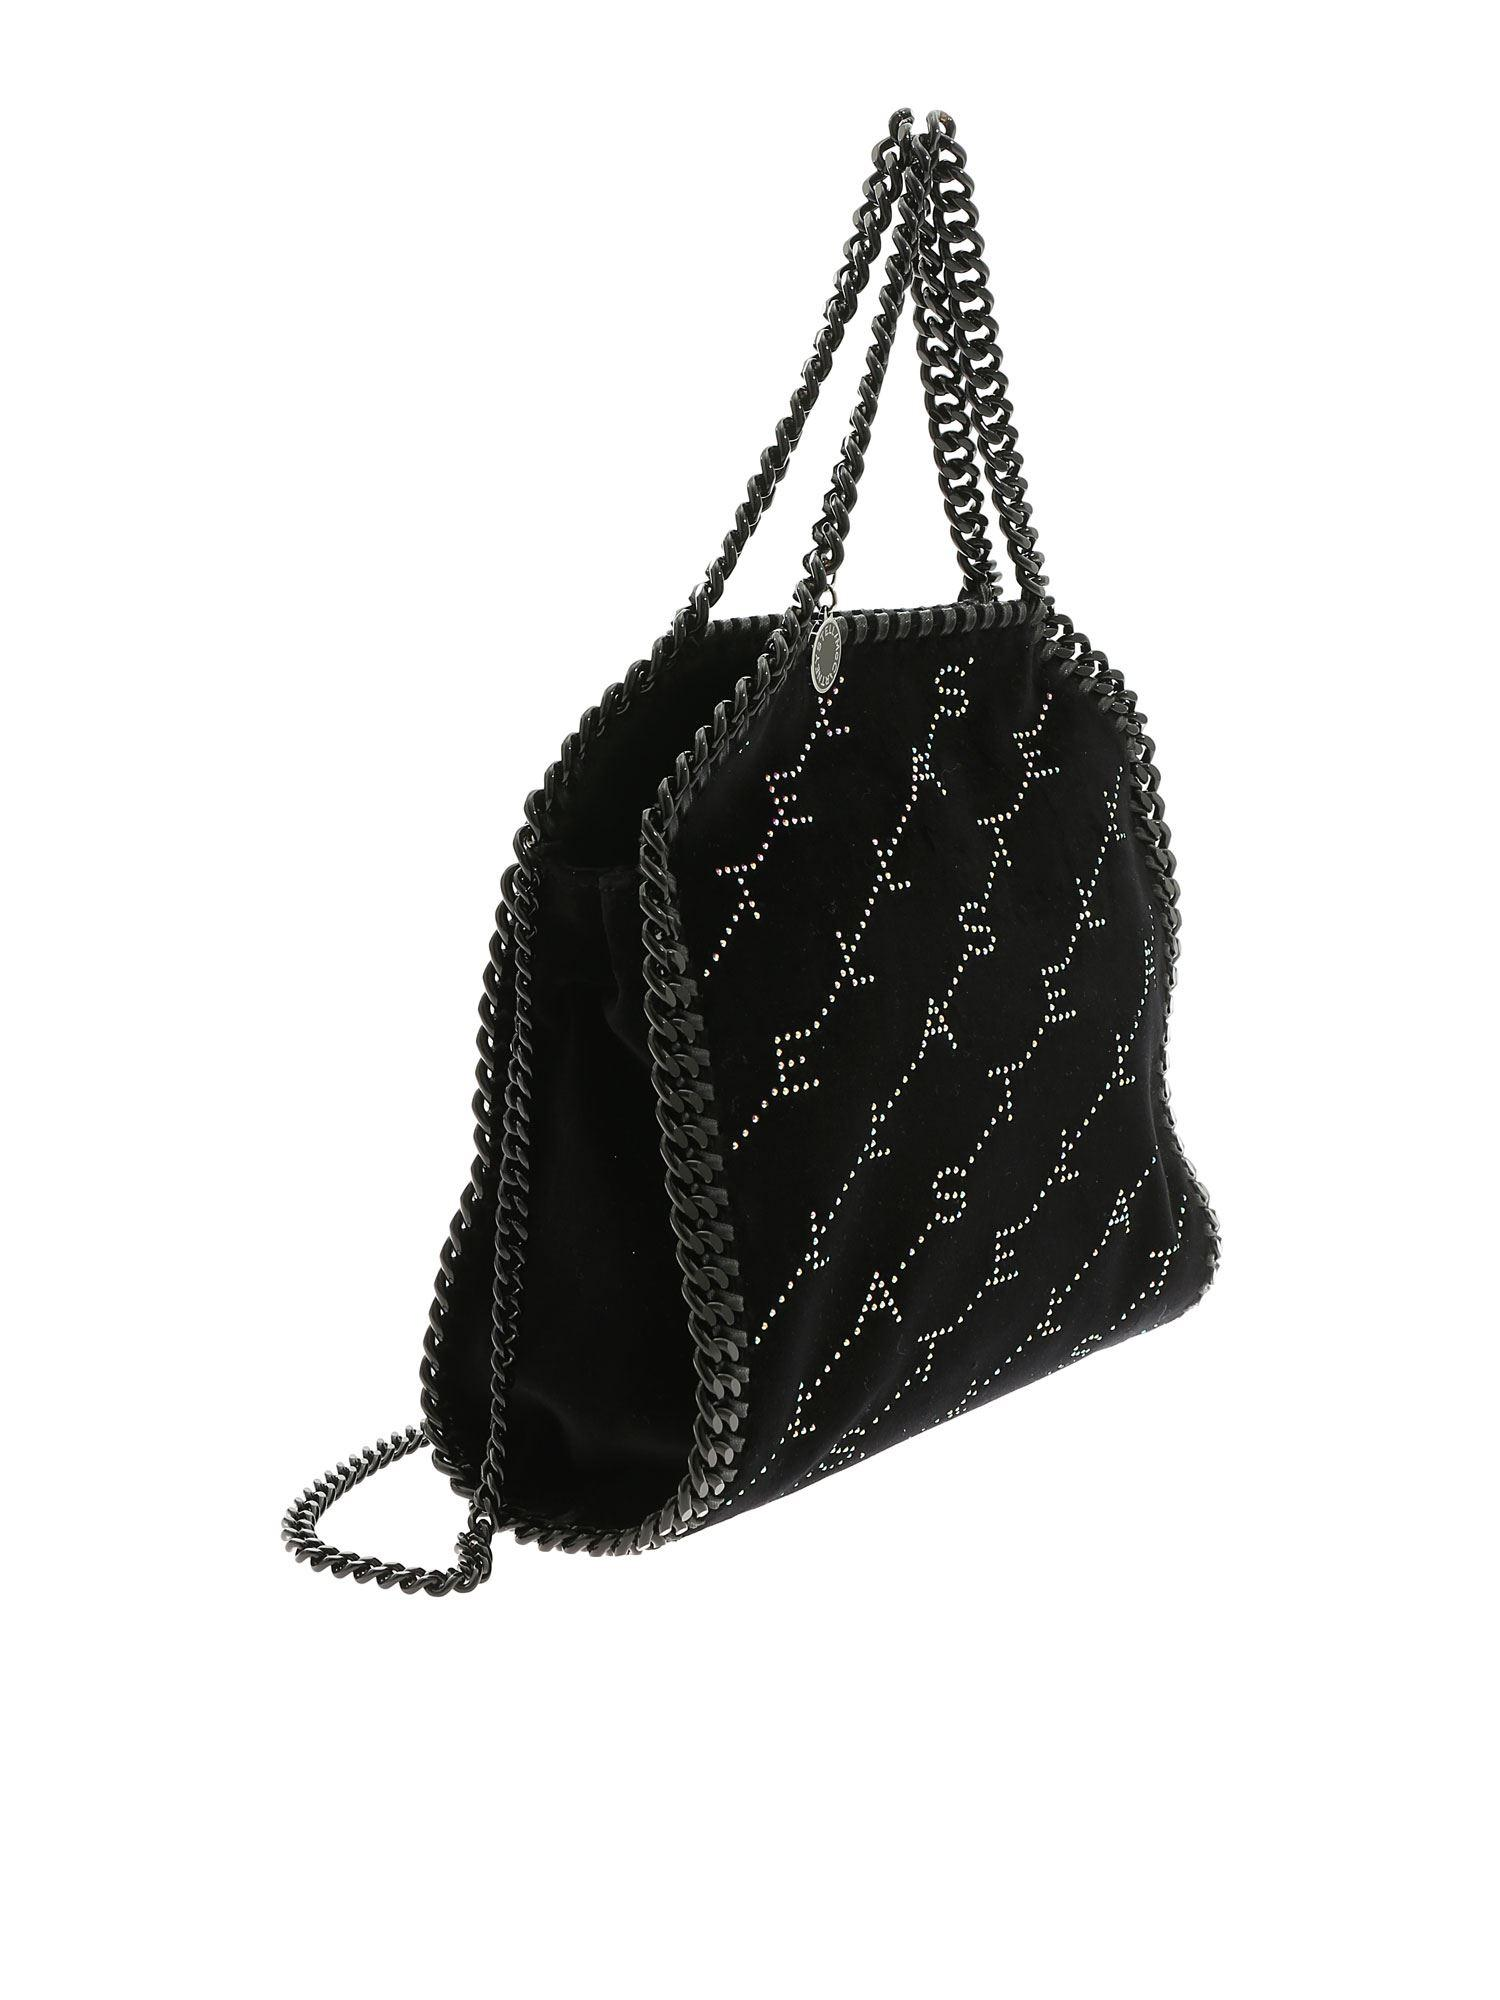 b92c88d0b2f6 Lyst - Stella Mccartney Falabella Mini Bag With Black Velvet Effect in Black